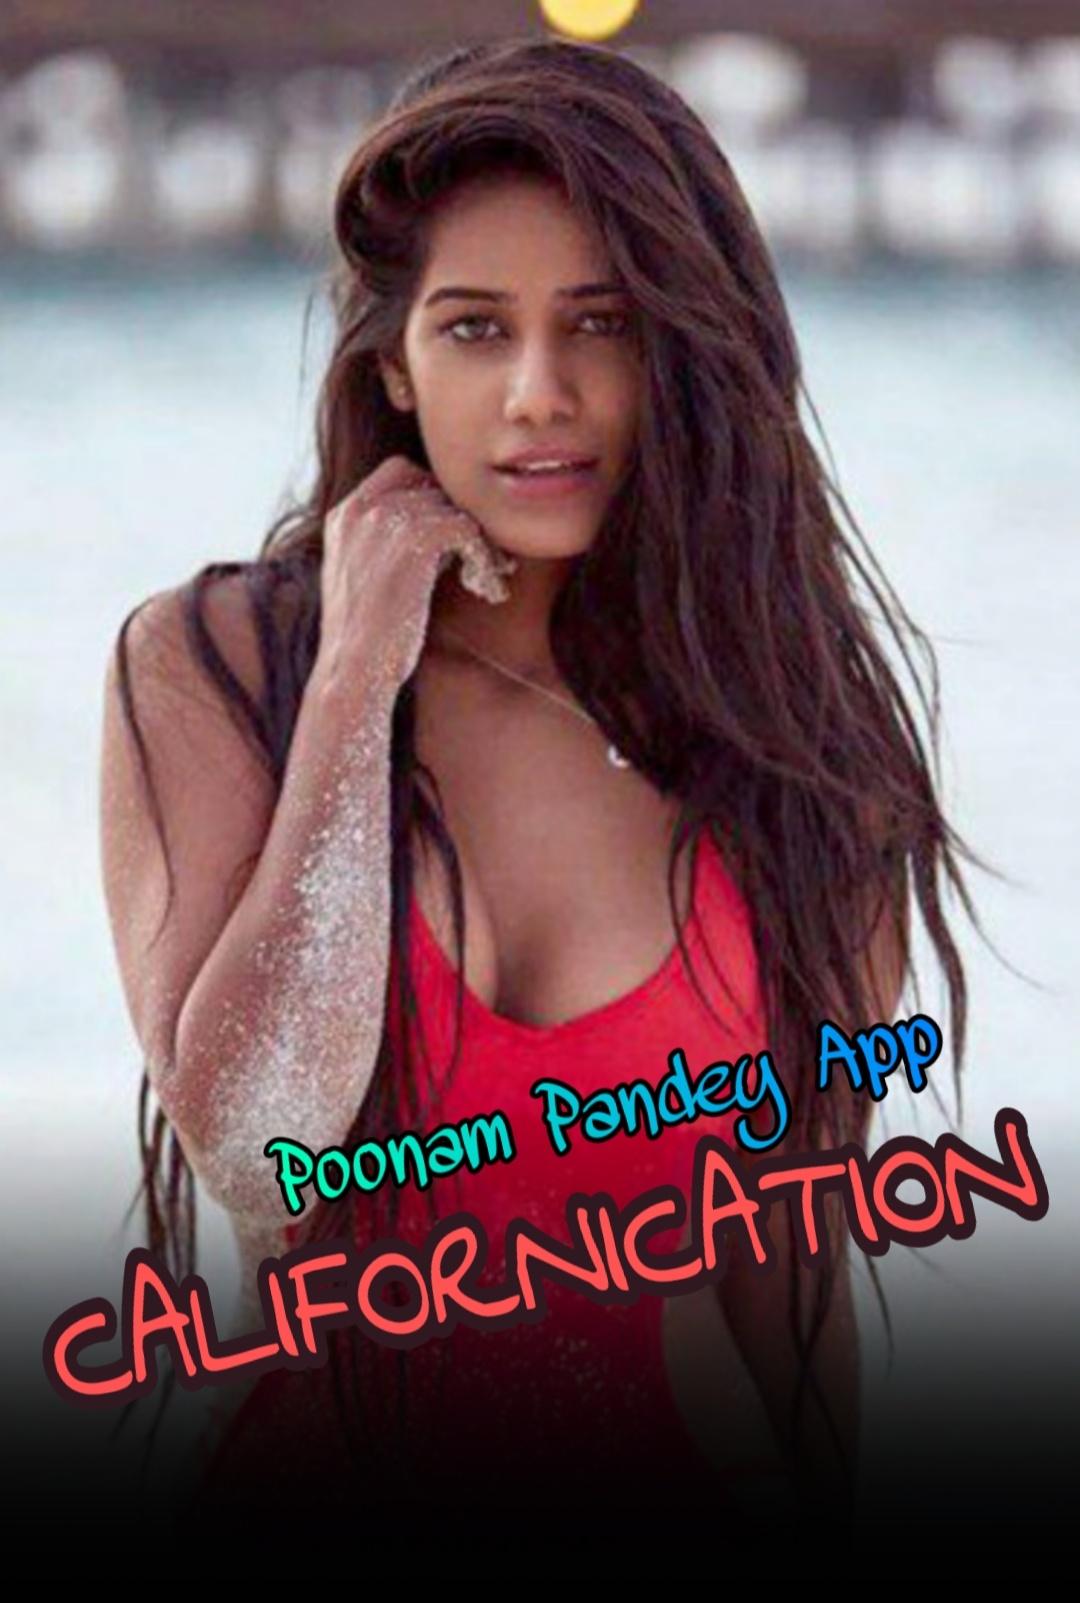 18+ Californication 2 (Poonam Pandey) 2021 Hindi Hot Video 720p HDRip Download